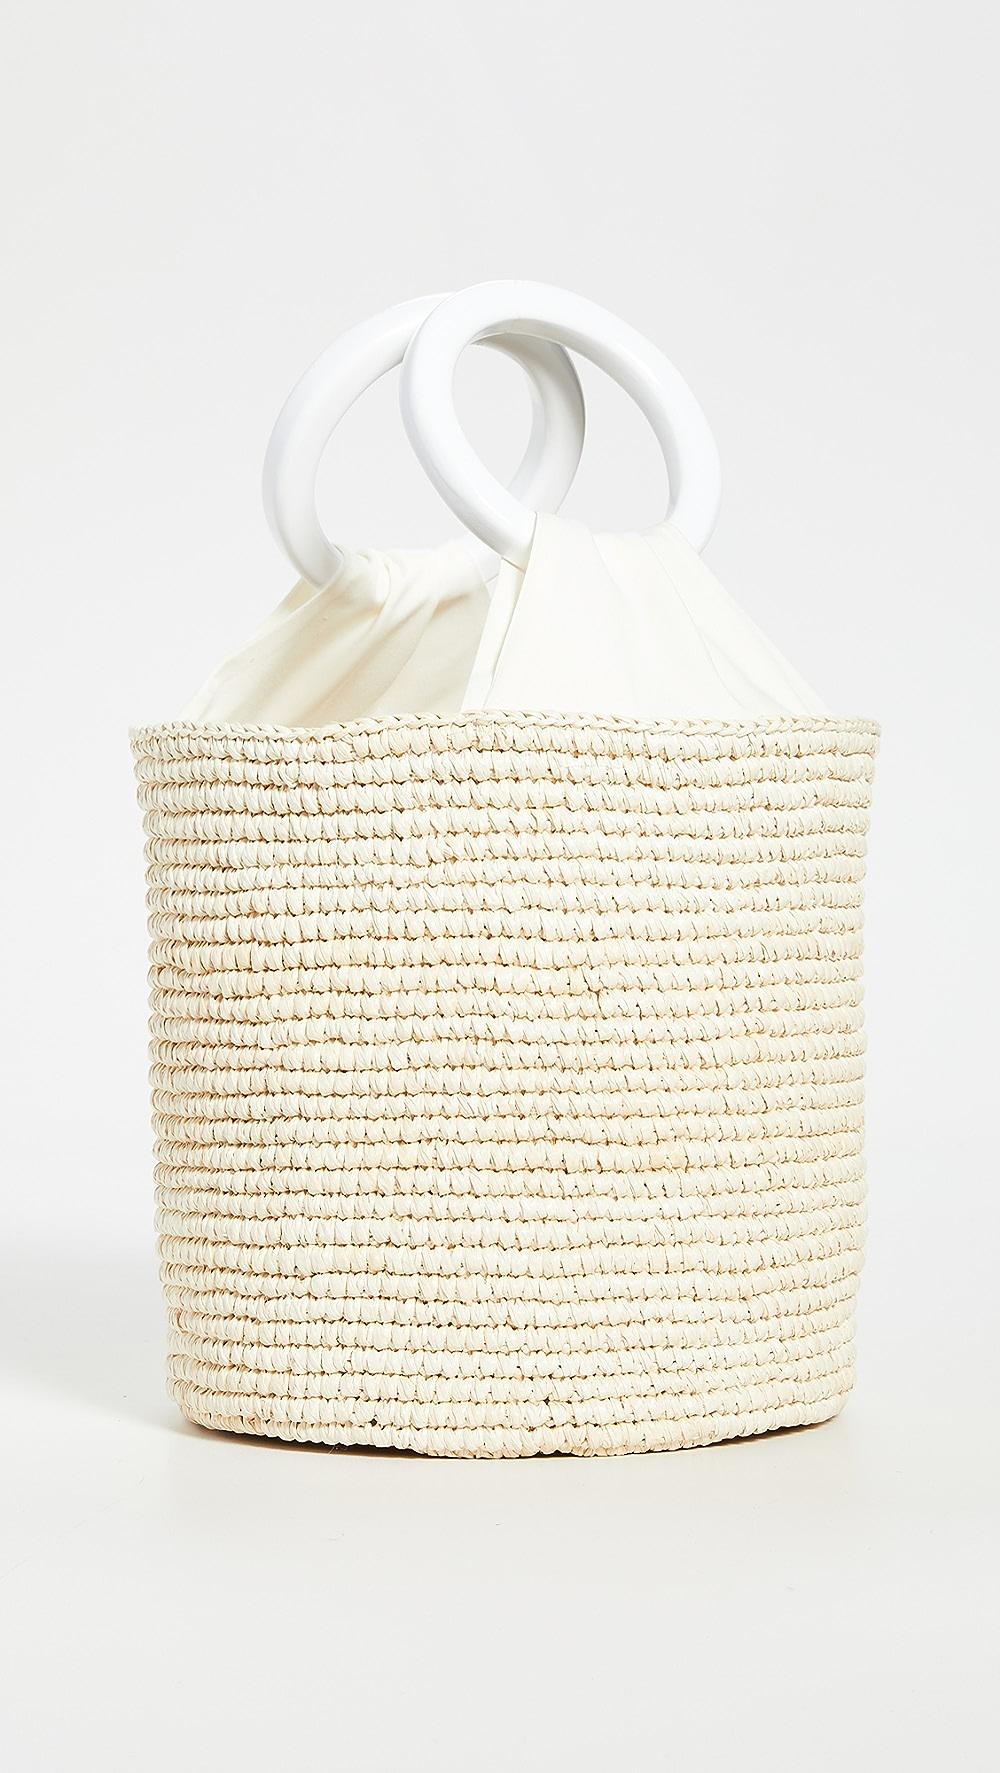 Apprehensive Sensi Studio - Medium Bucket Bag Wide Selection;